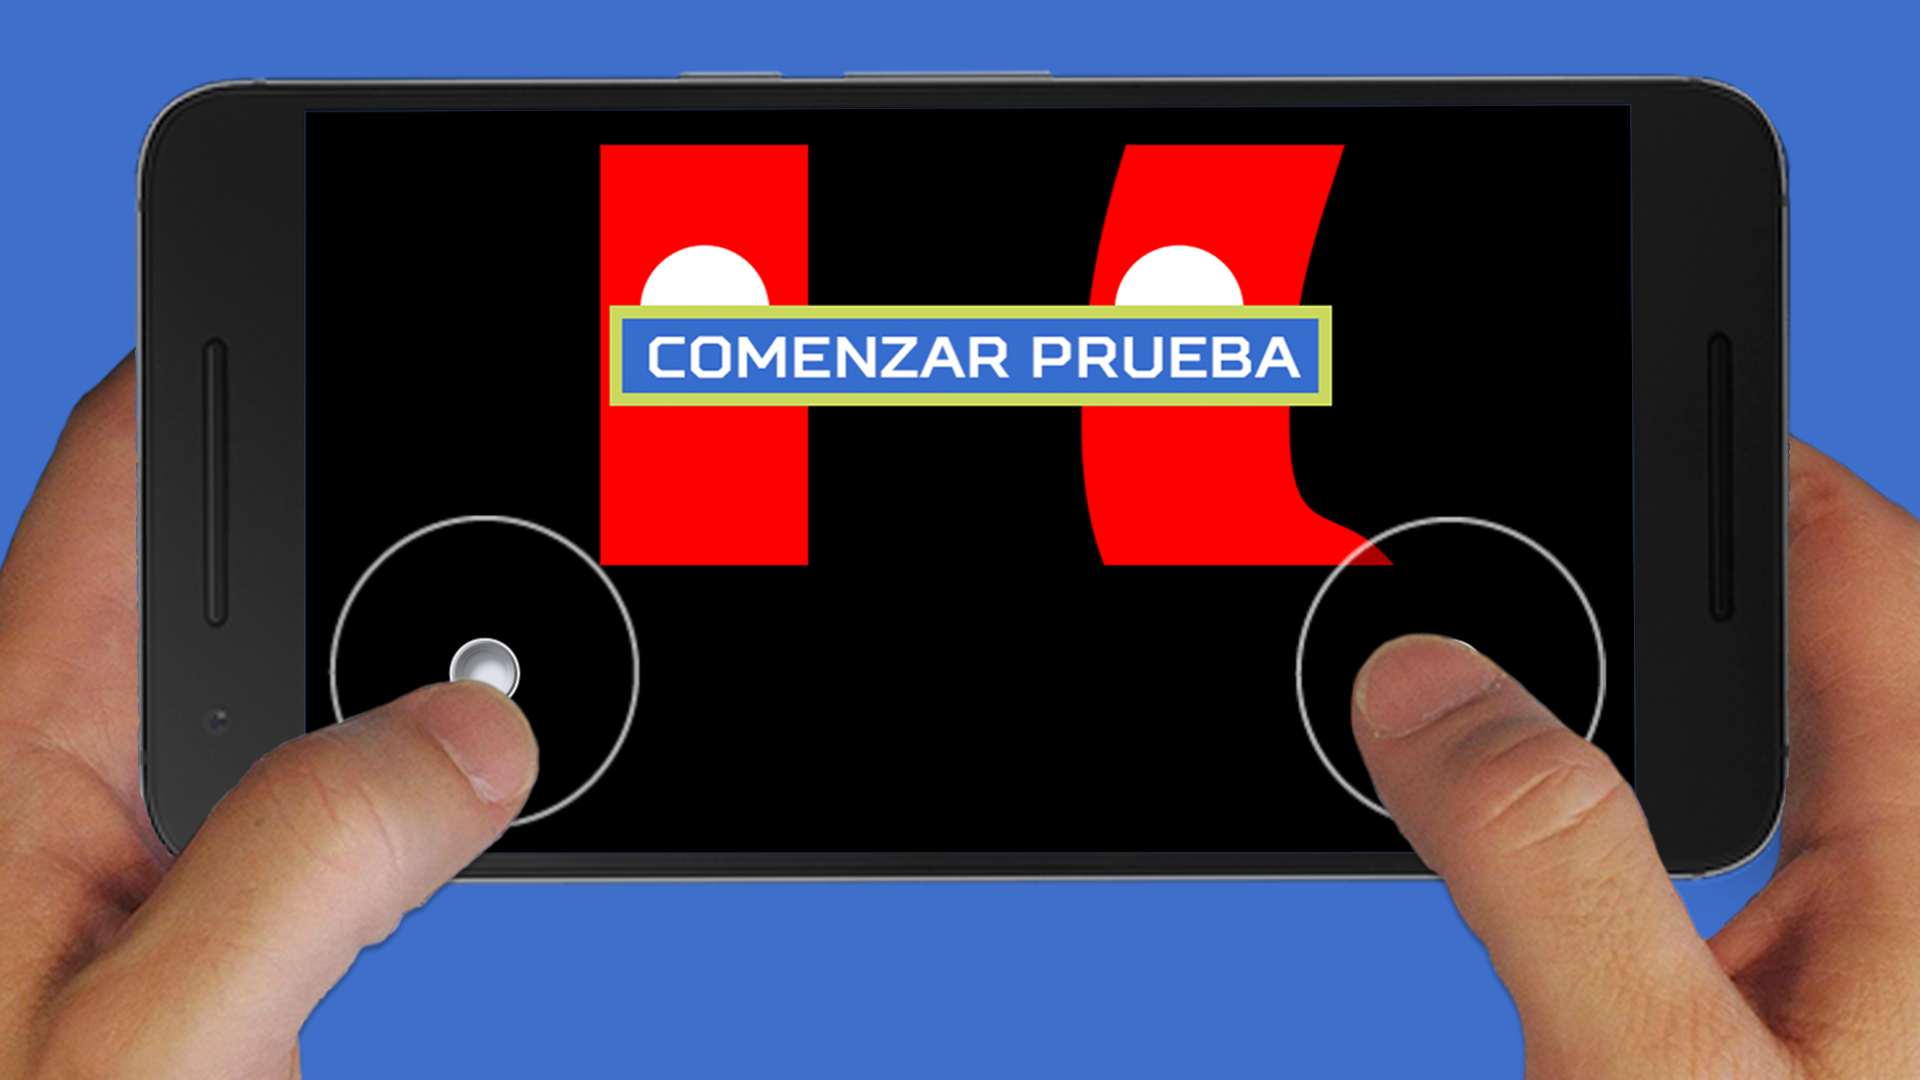 Driver Test - Carnet Conducir: Amazon.es: Appstore para